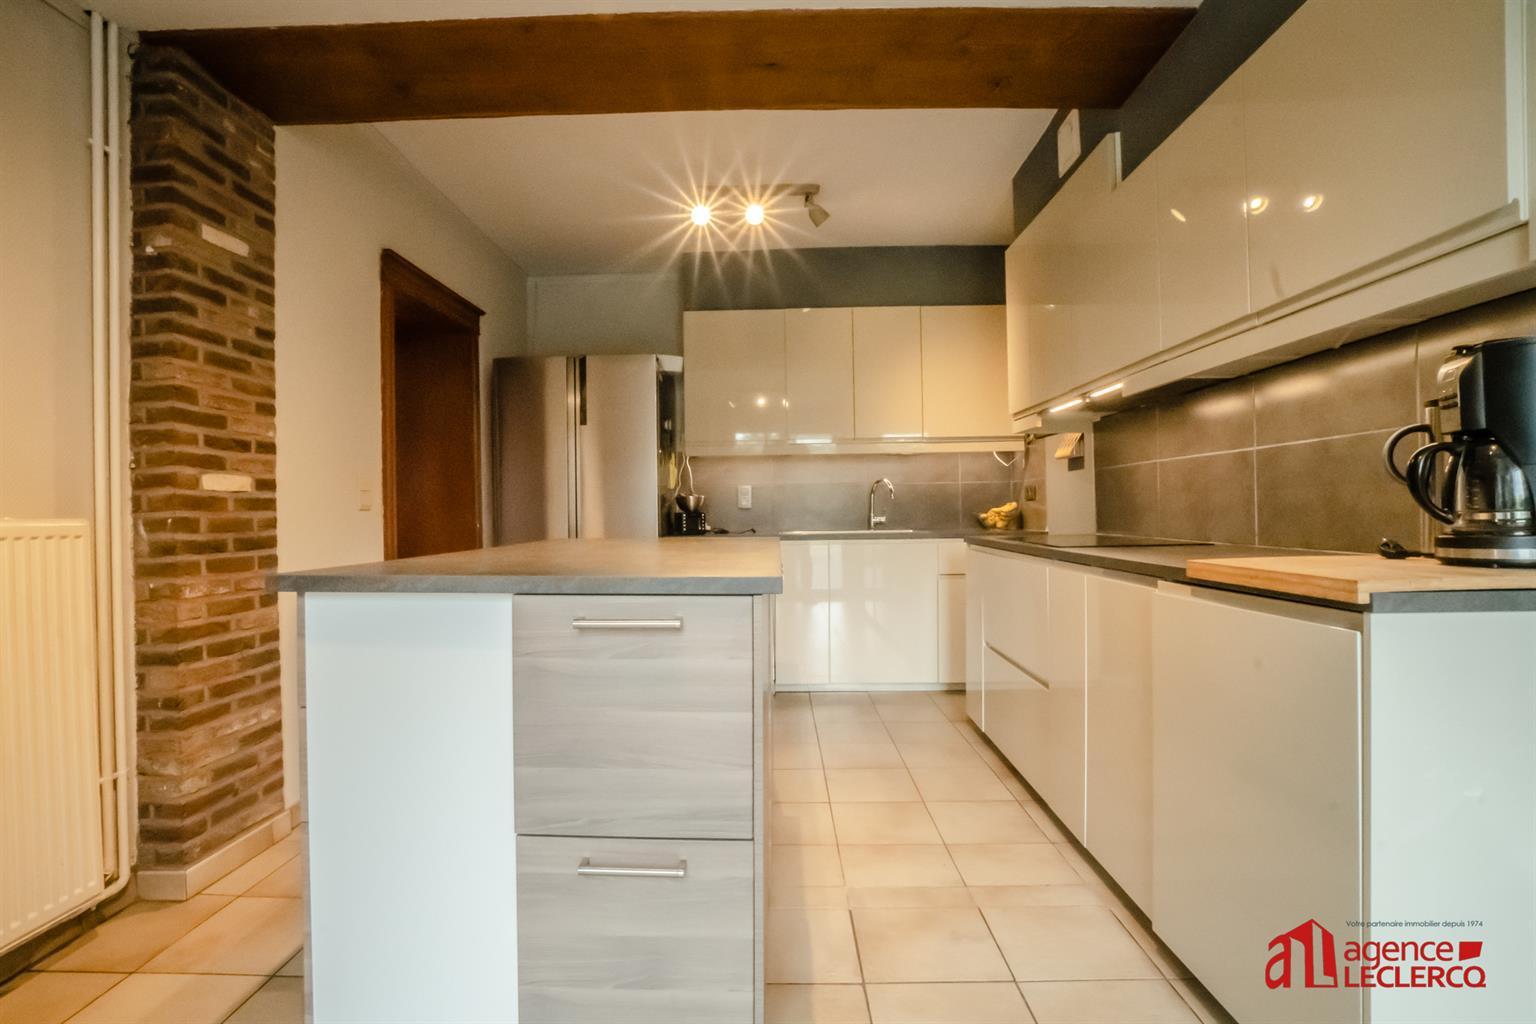 Maison - Gaurain-Ramecroix - #4408184-8